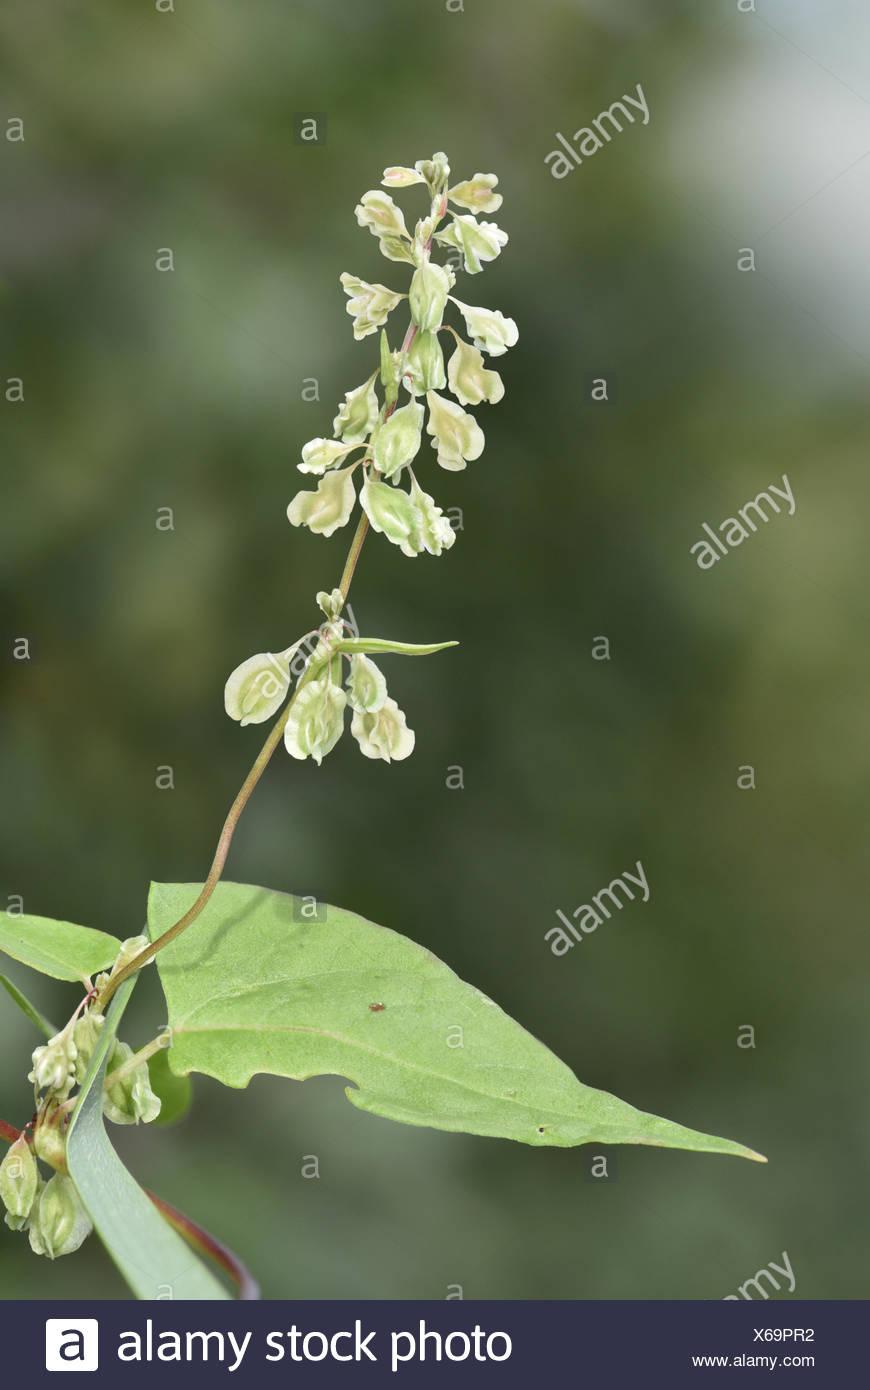 Copse-bindweed - Fallopia dumetorum - Stock Image